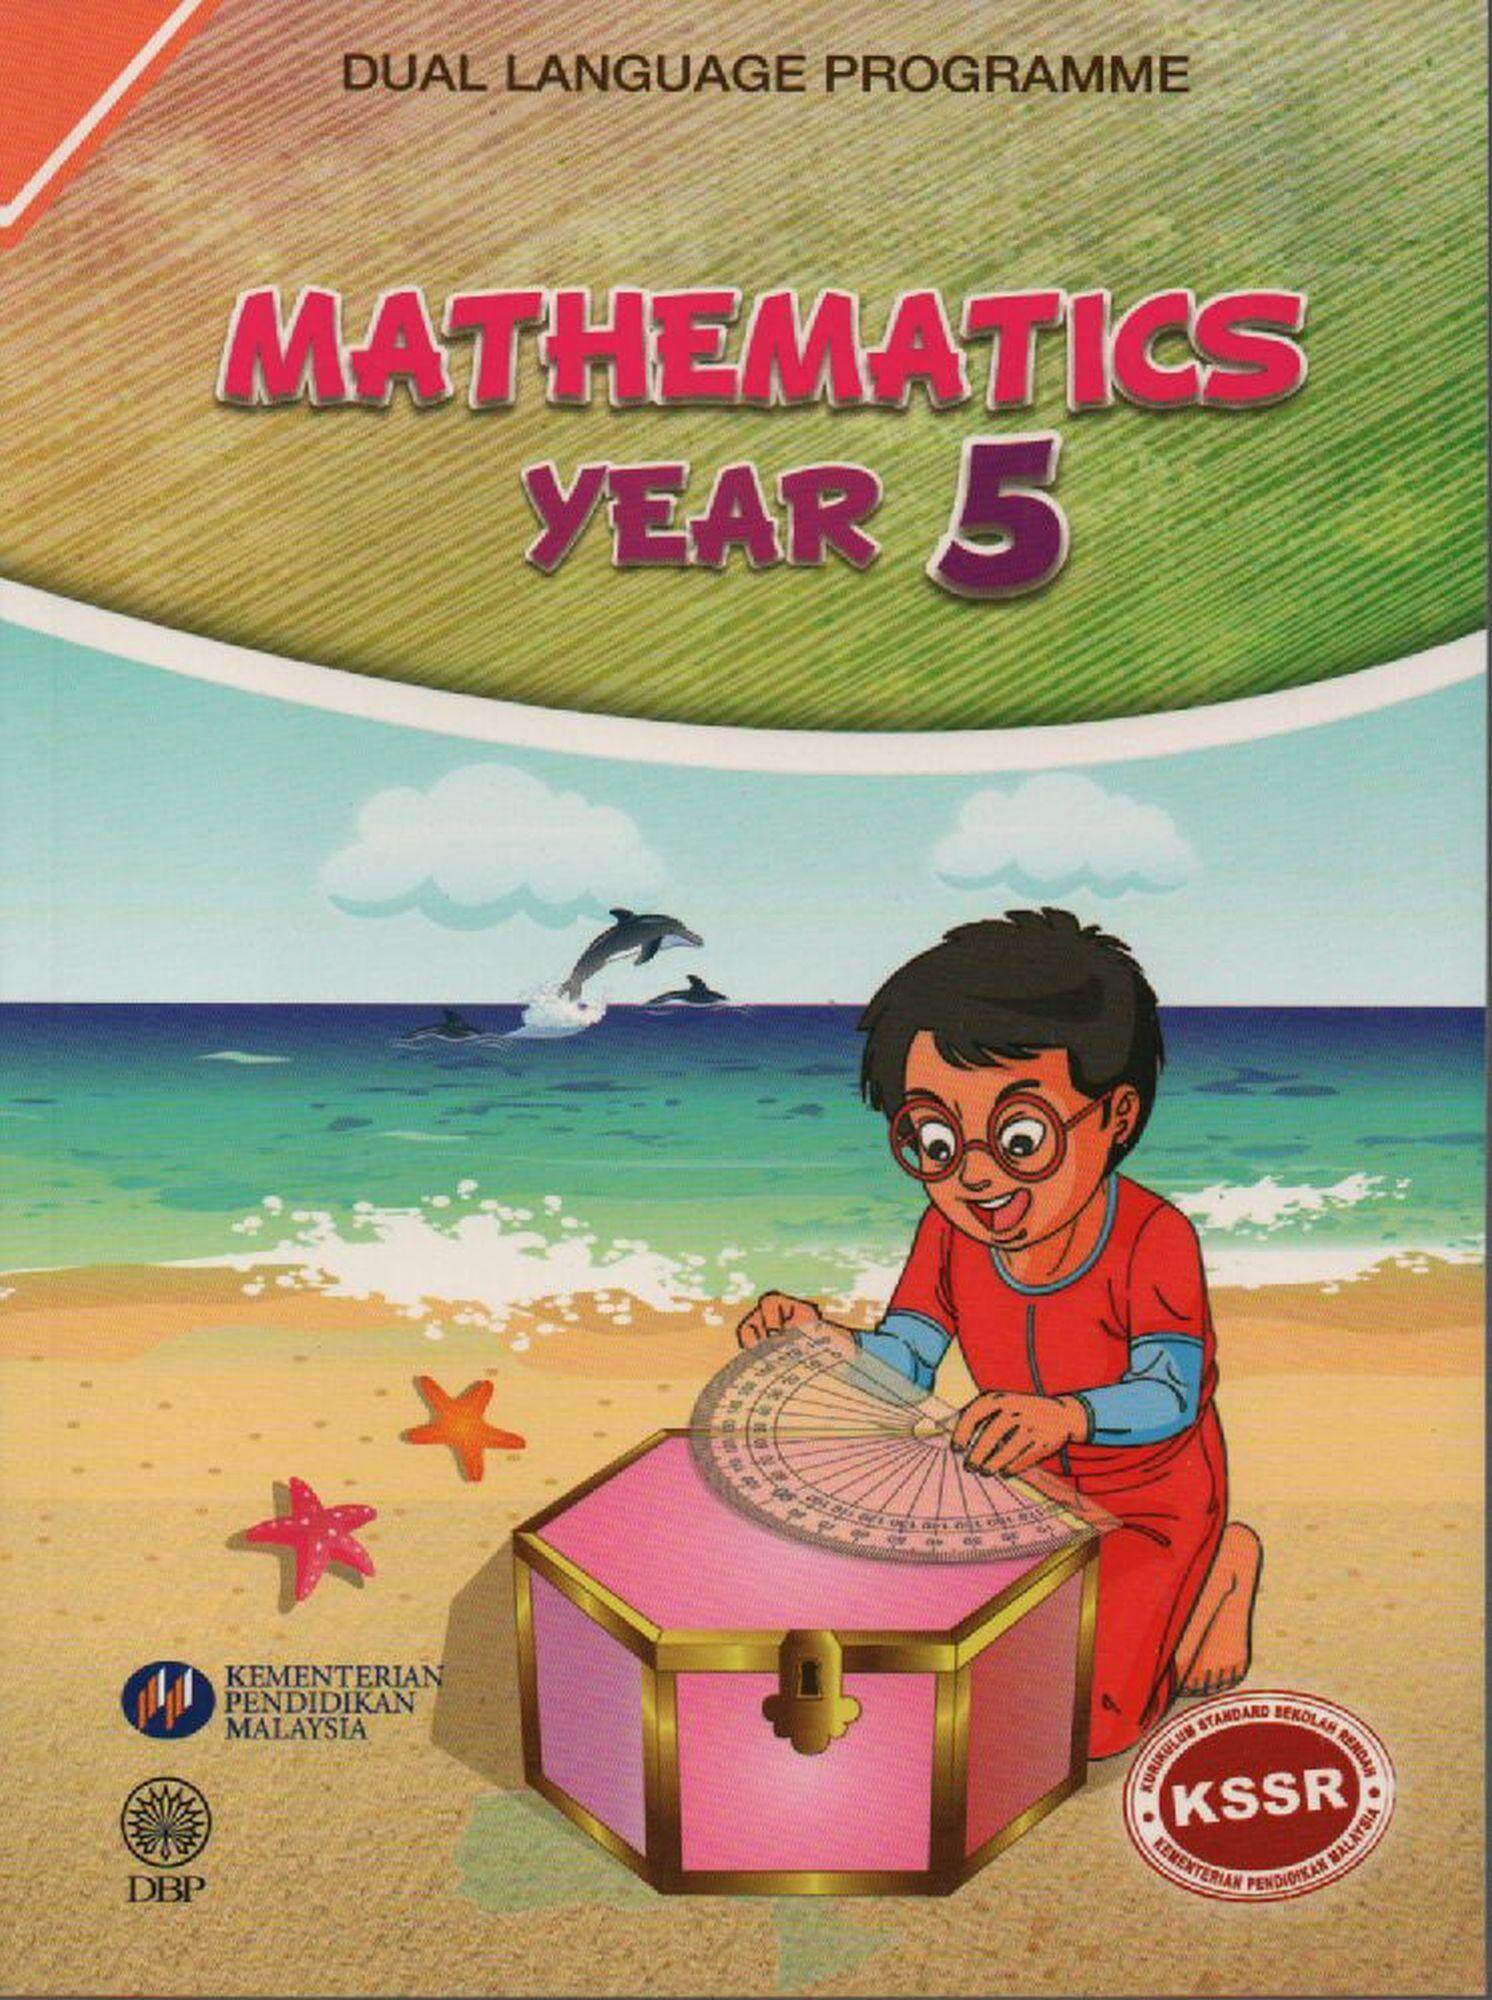 DBP-Mathematics Year 5 DLP/KSSR Buku Teks -2018